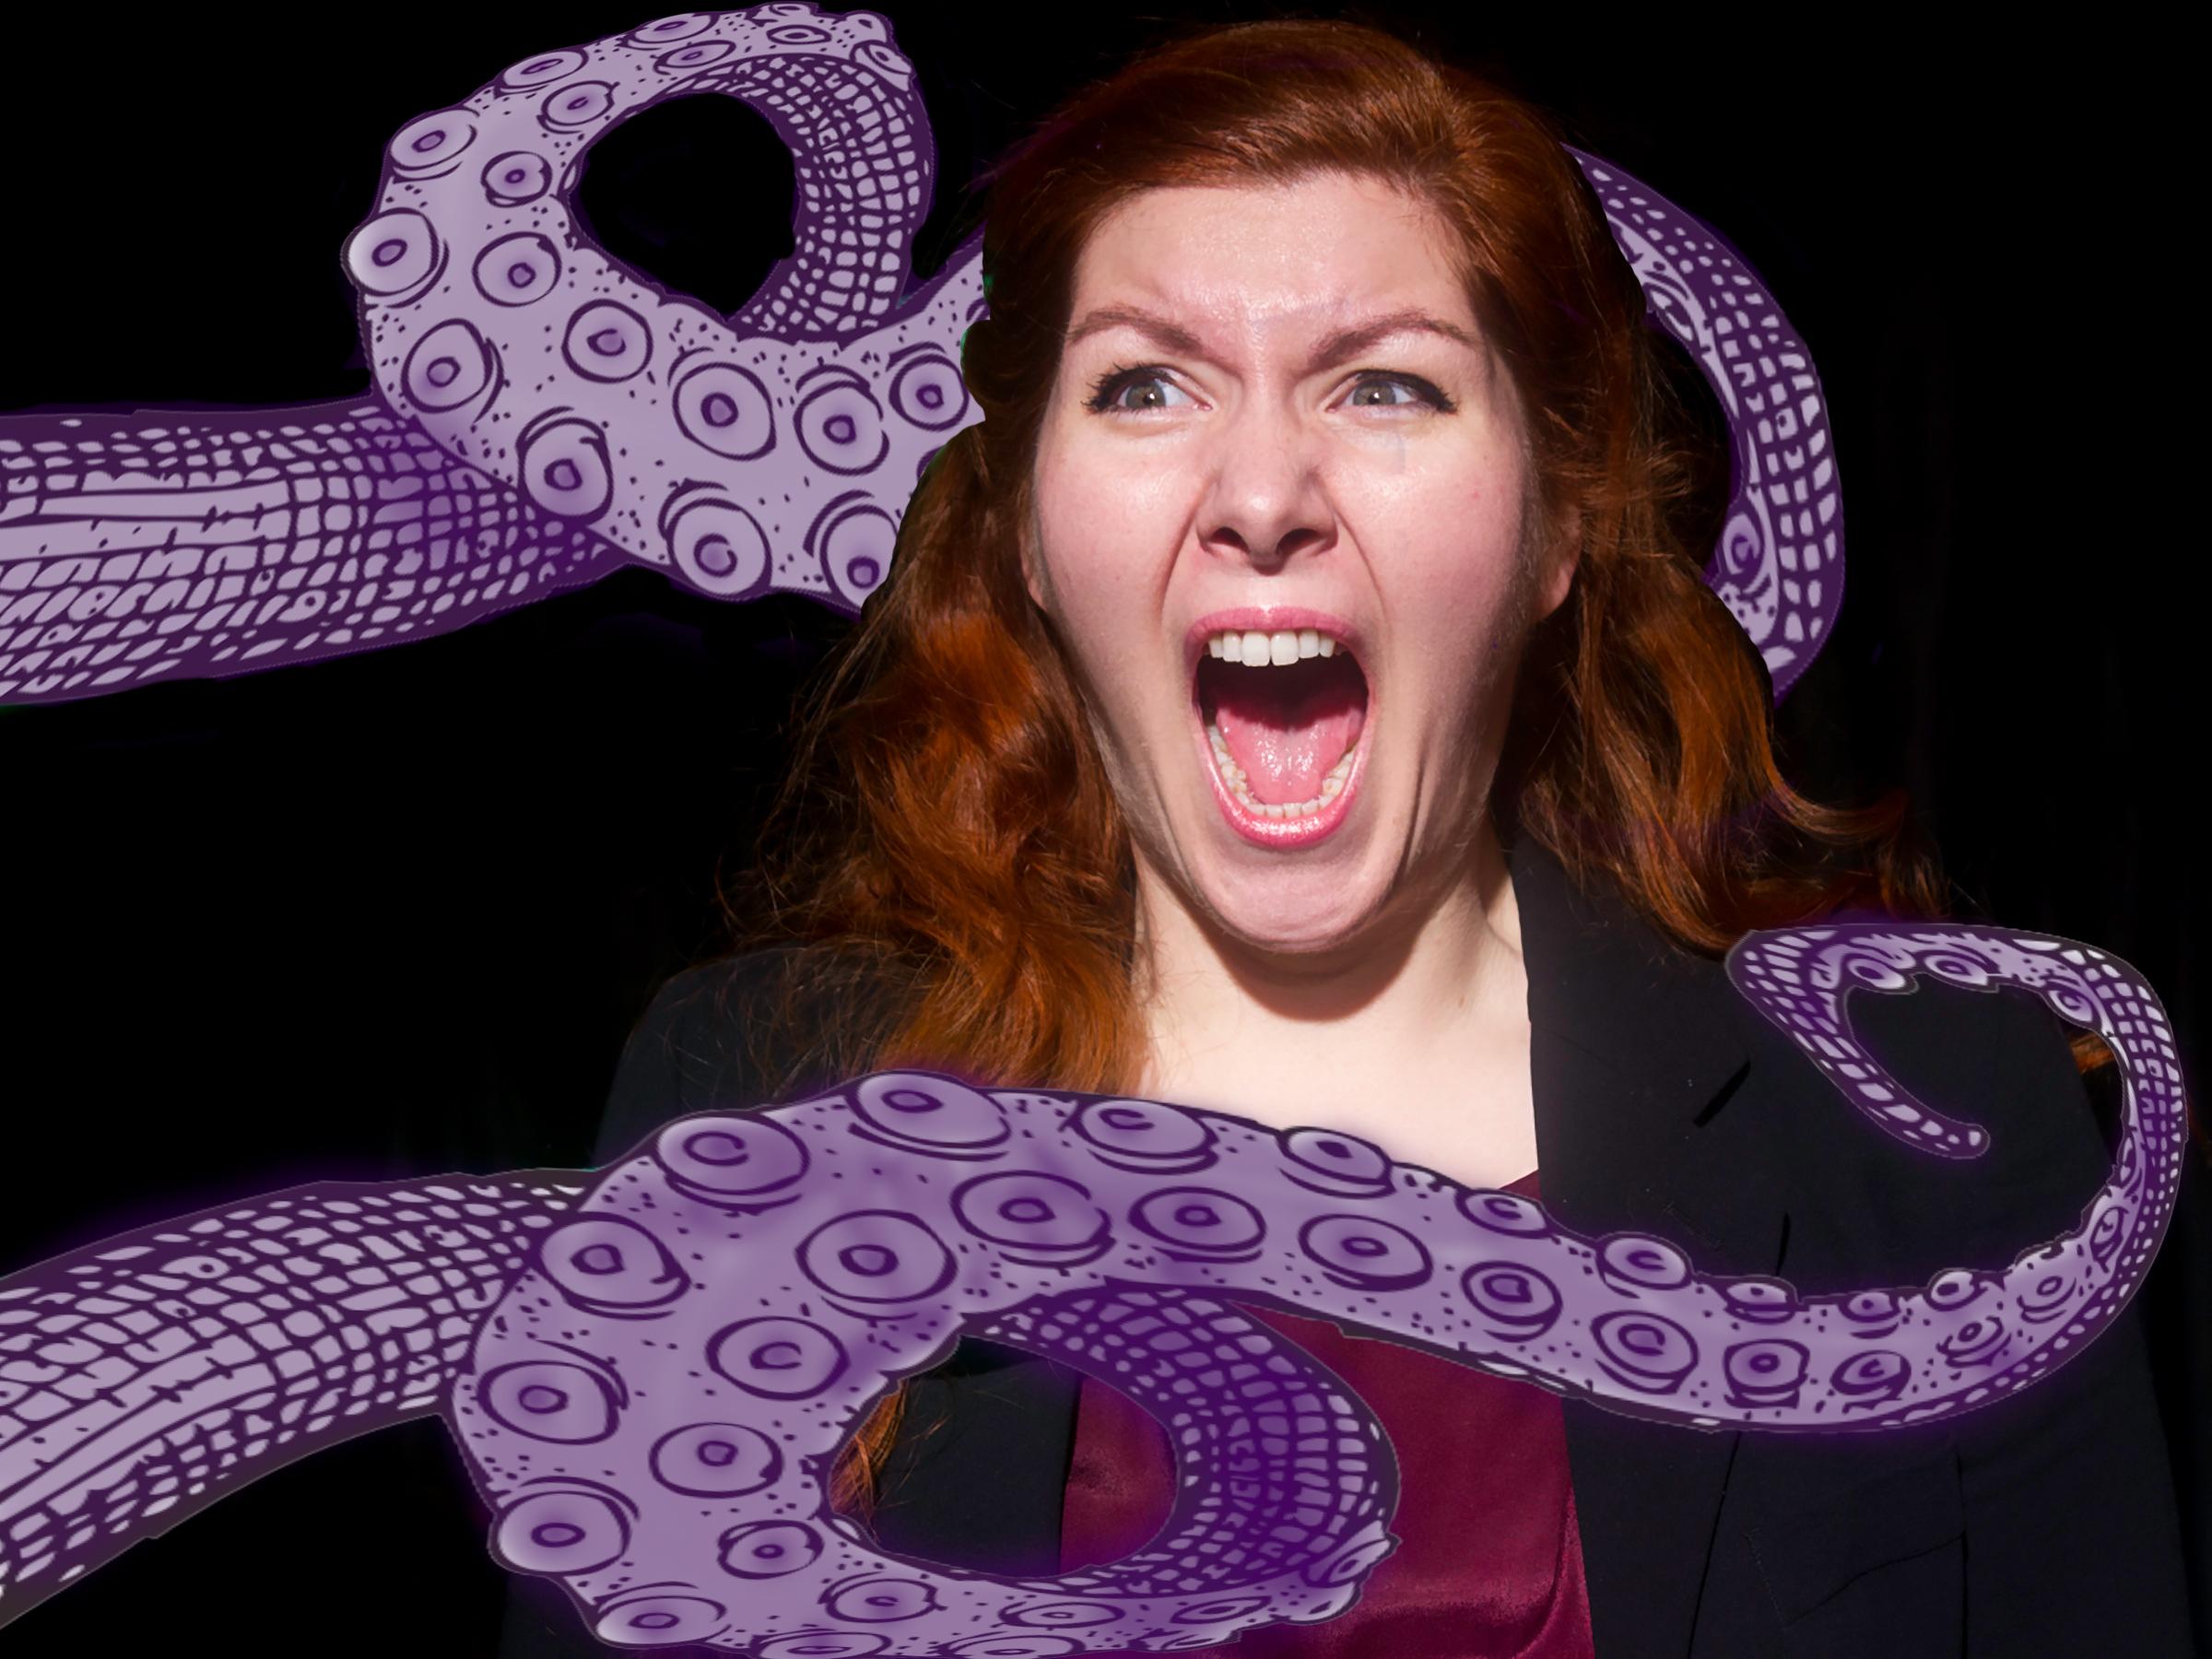 tentaclesJodyChristophersonScream02.jpg